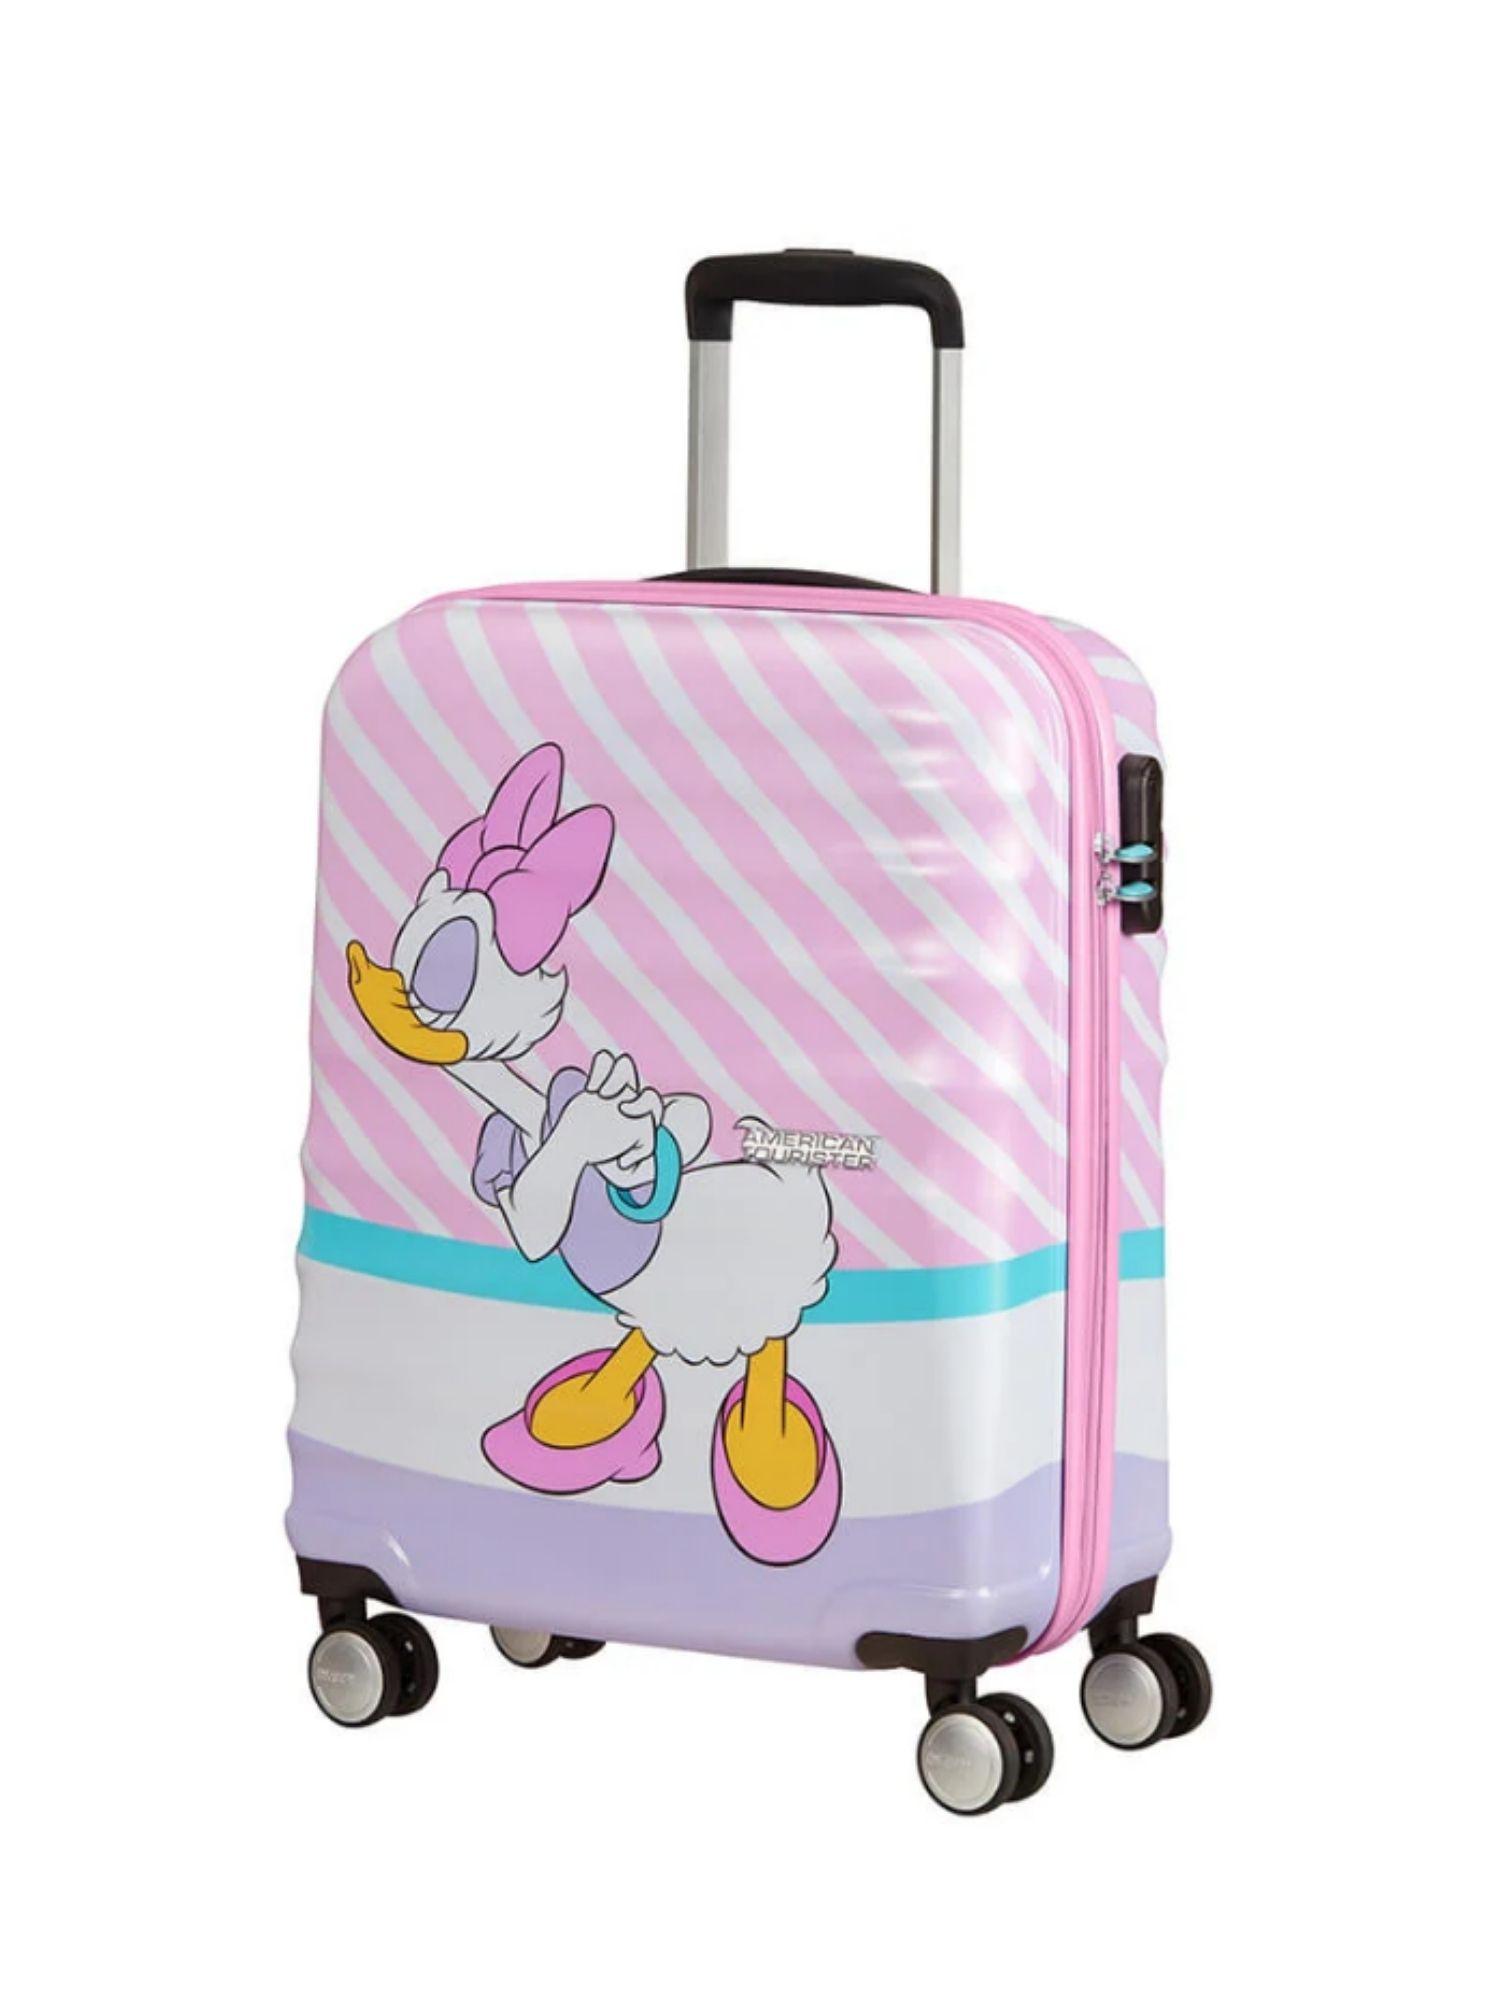 Trolley American Tourister 4 ruote 55 cm. Wavebreaker Disney Daisy Pink Kiss